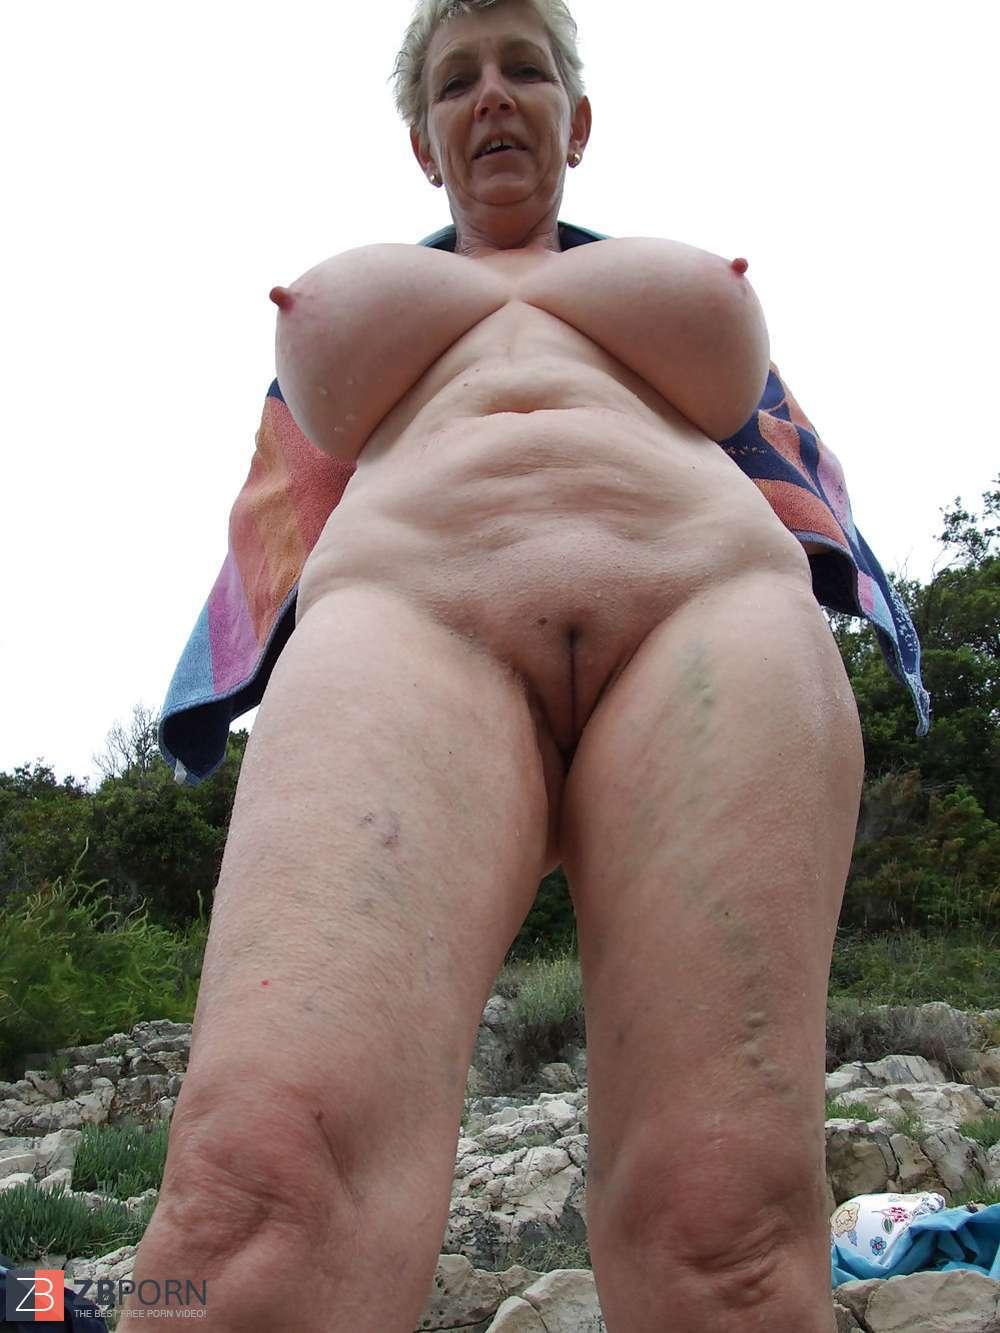 Naturist Granny Mega-Bitch  Zb Porn-3207